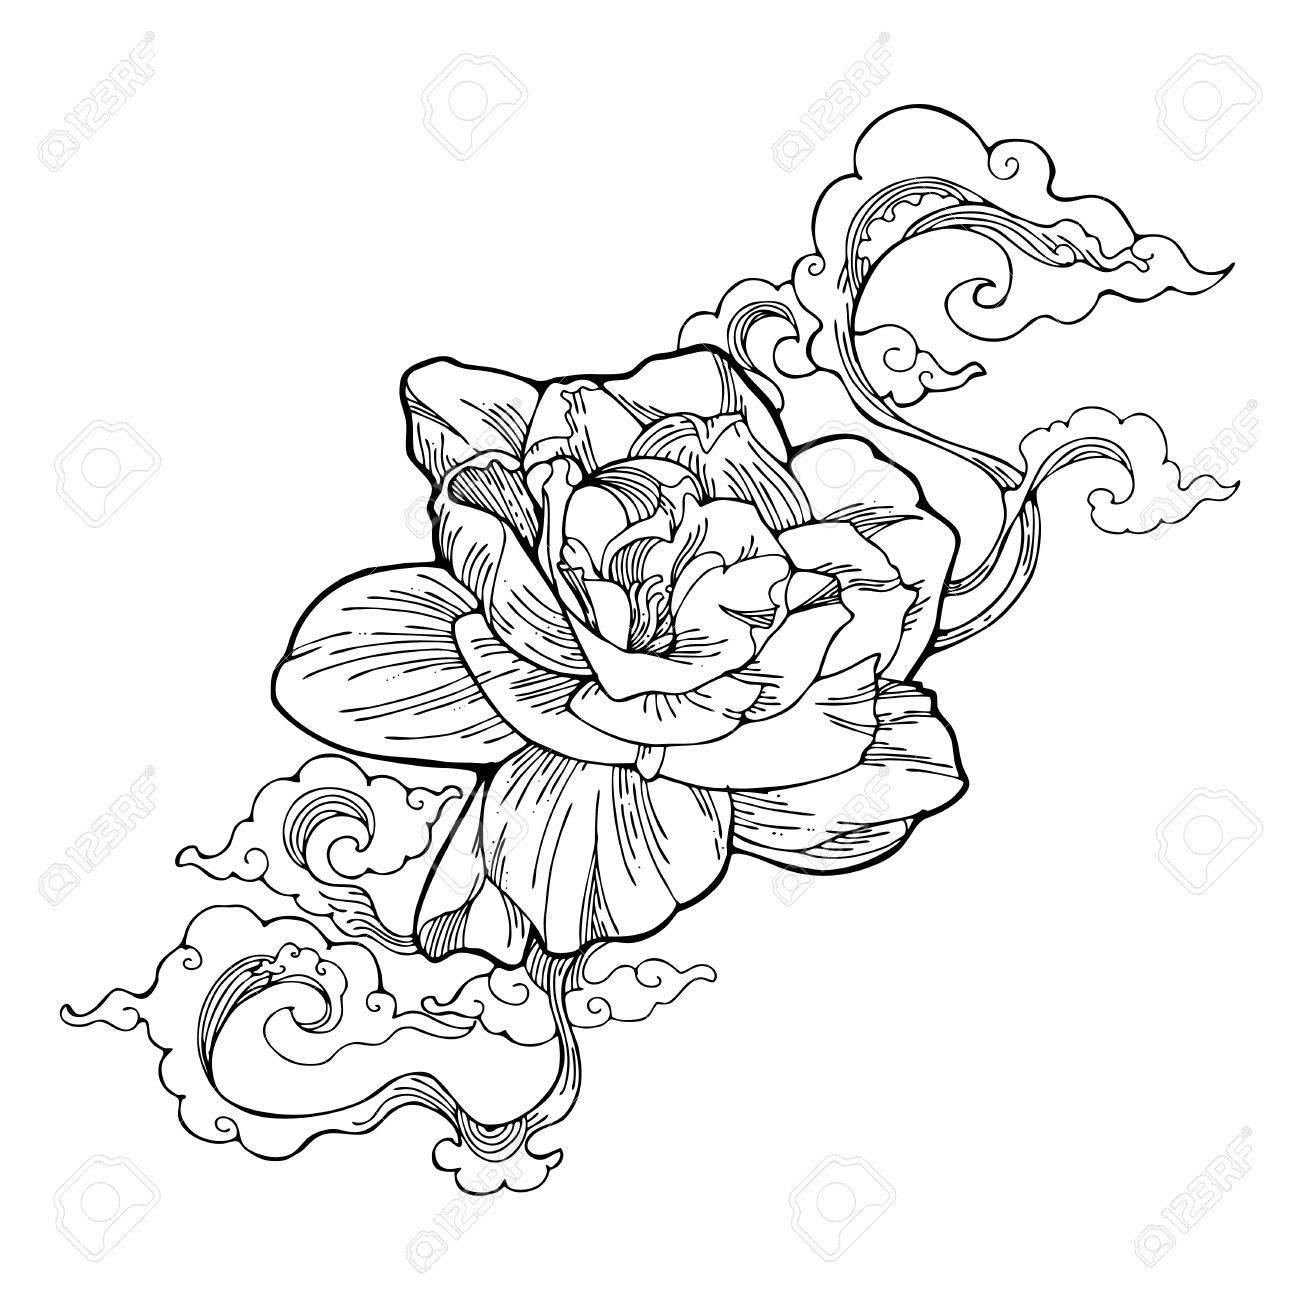 Cape jasmine gardenia jasmine and aroma cloud design by ink cape jasmine gardenia jasmine and aroma cloud design by ink drawing tattoo vector with white izmirmasajfo Images